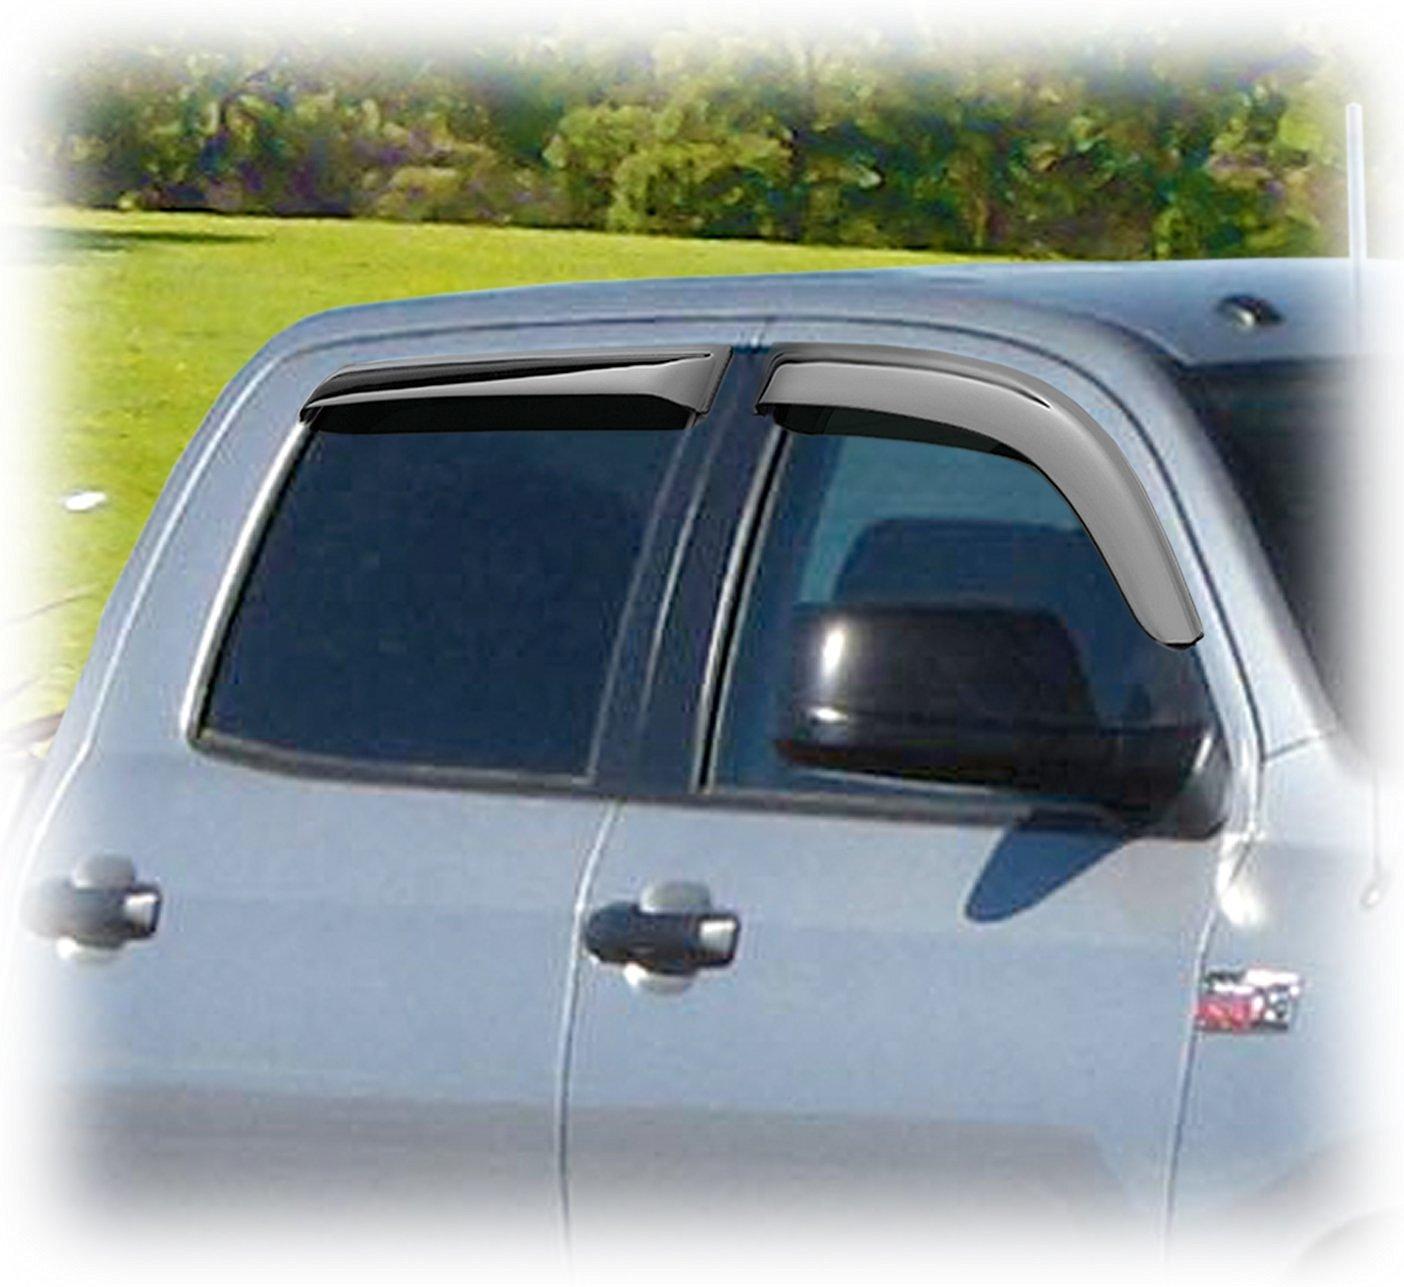 AUTEX 4Pcs Tape On Window Visor Compatible with Toyota Tacoma Crew Cab 2005 2006 2007 2008 2009 2010 2011 2012 2013 2014 2015 Window Deflector Sun Rain Guard